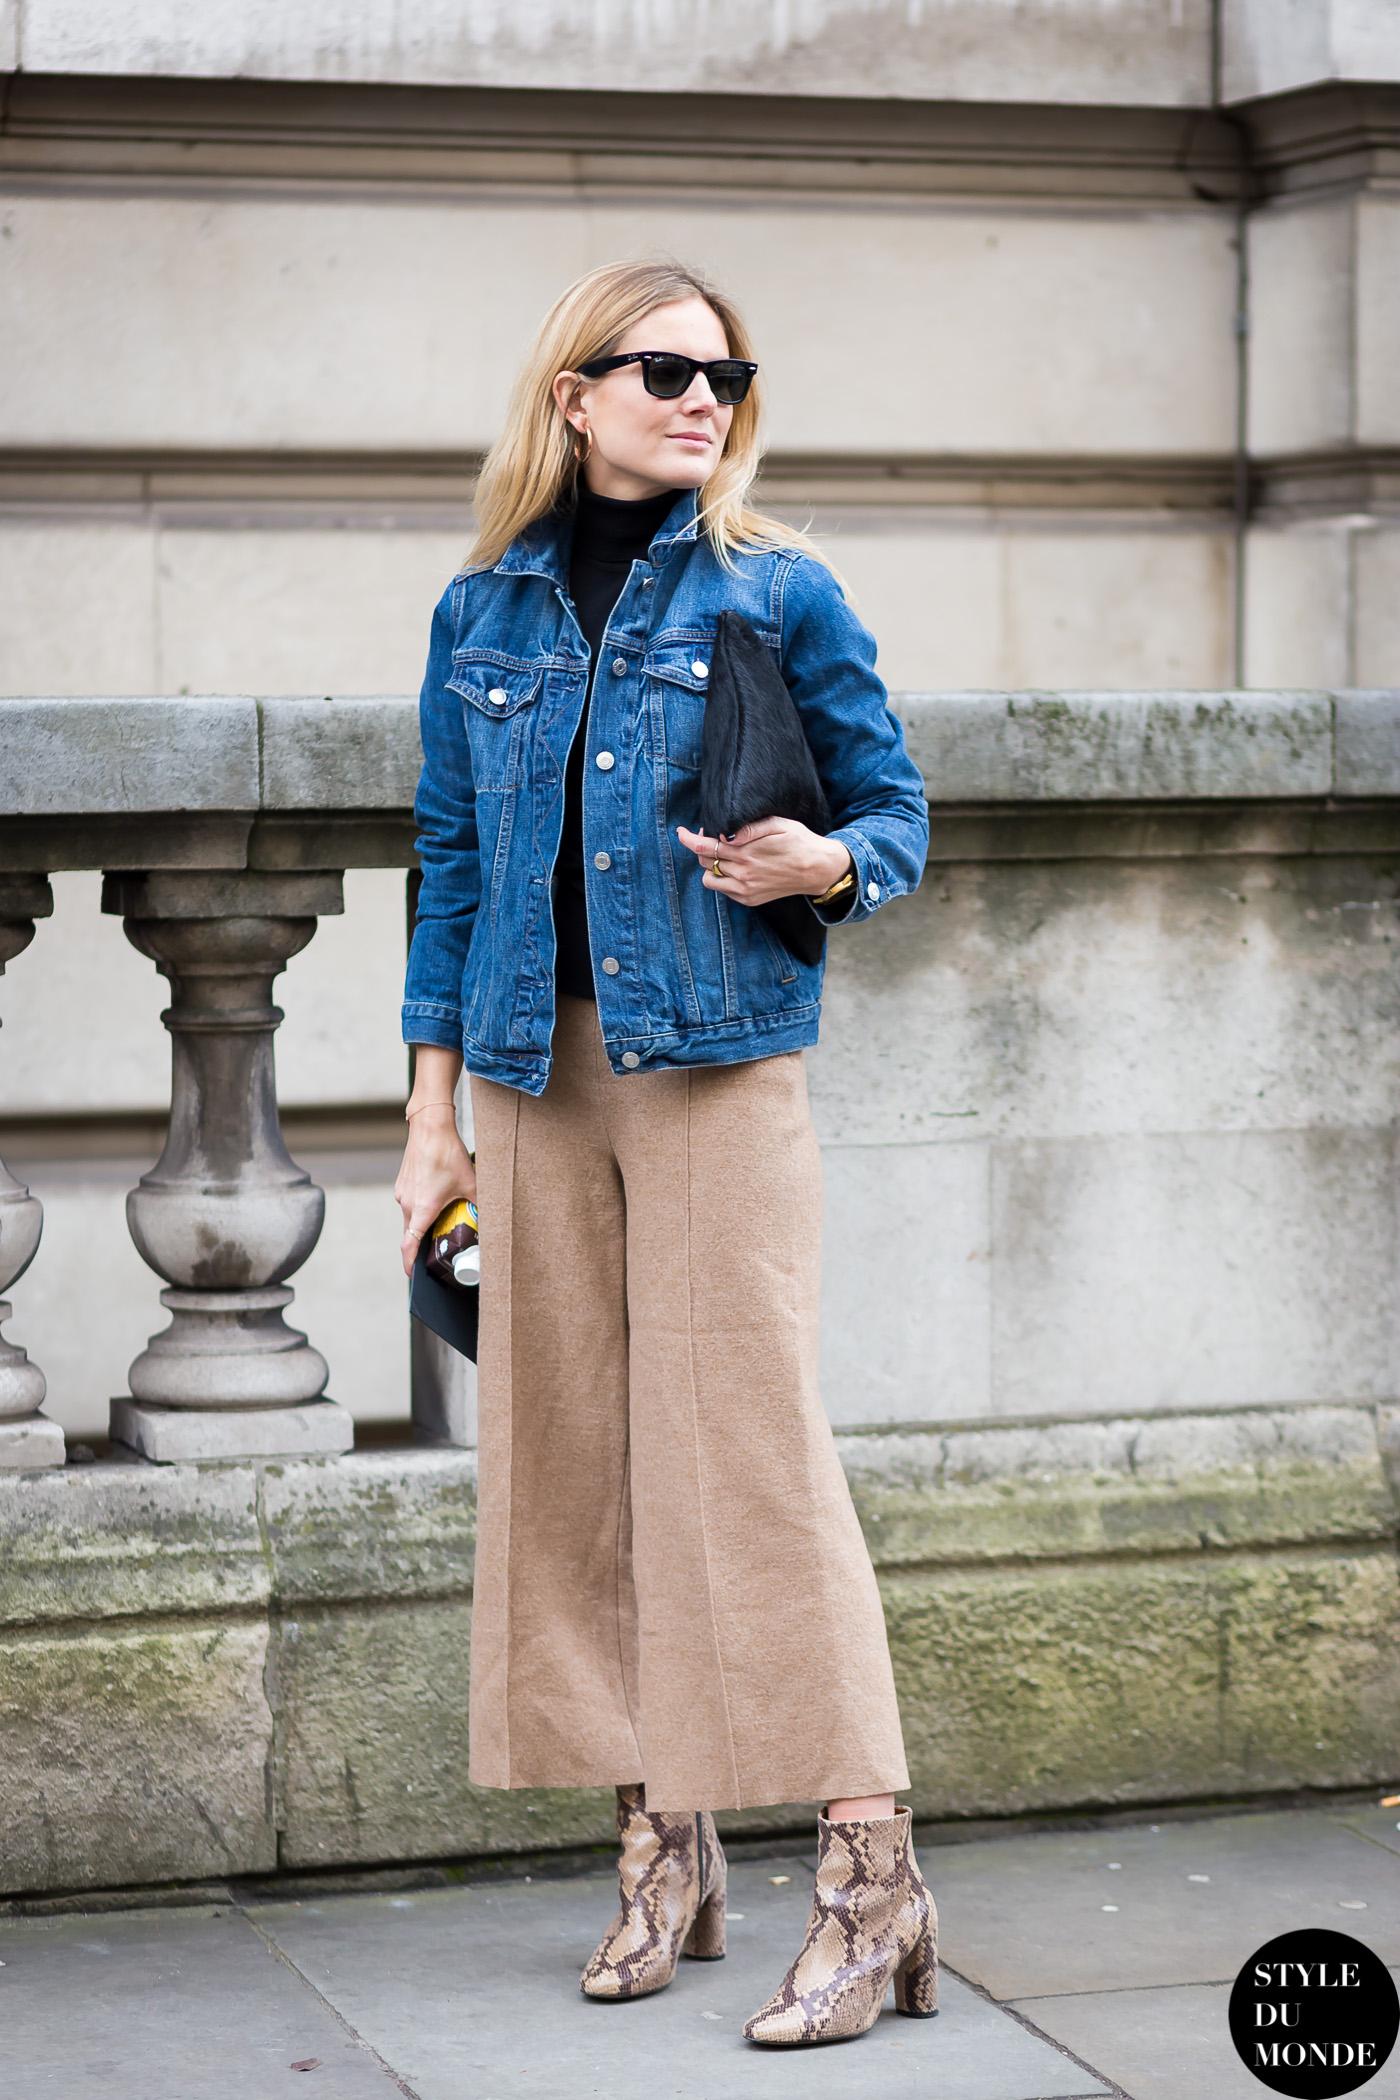 London Fashion Week FW 2015 Street Style: Lucy Williams